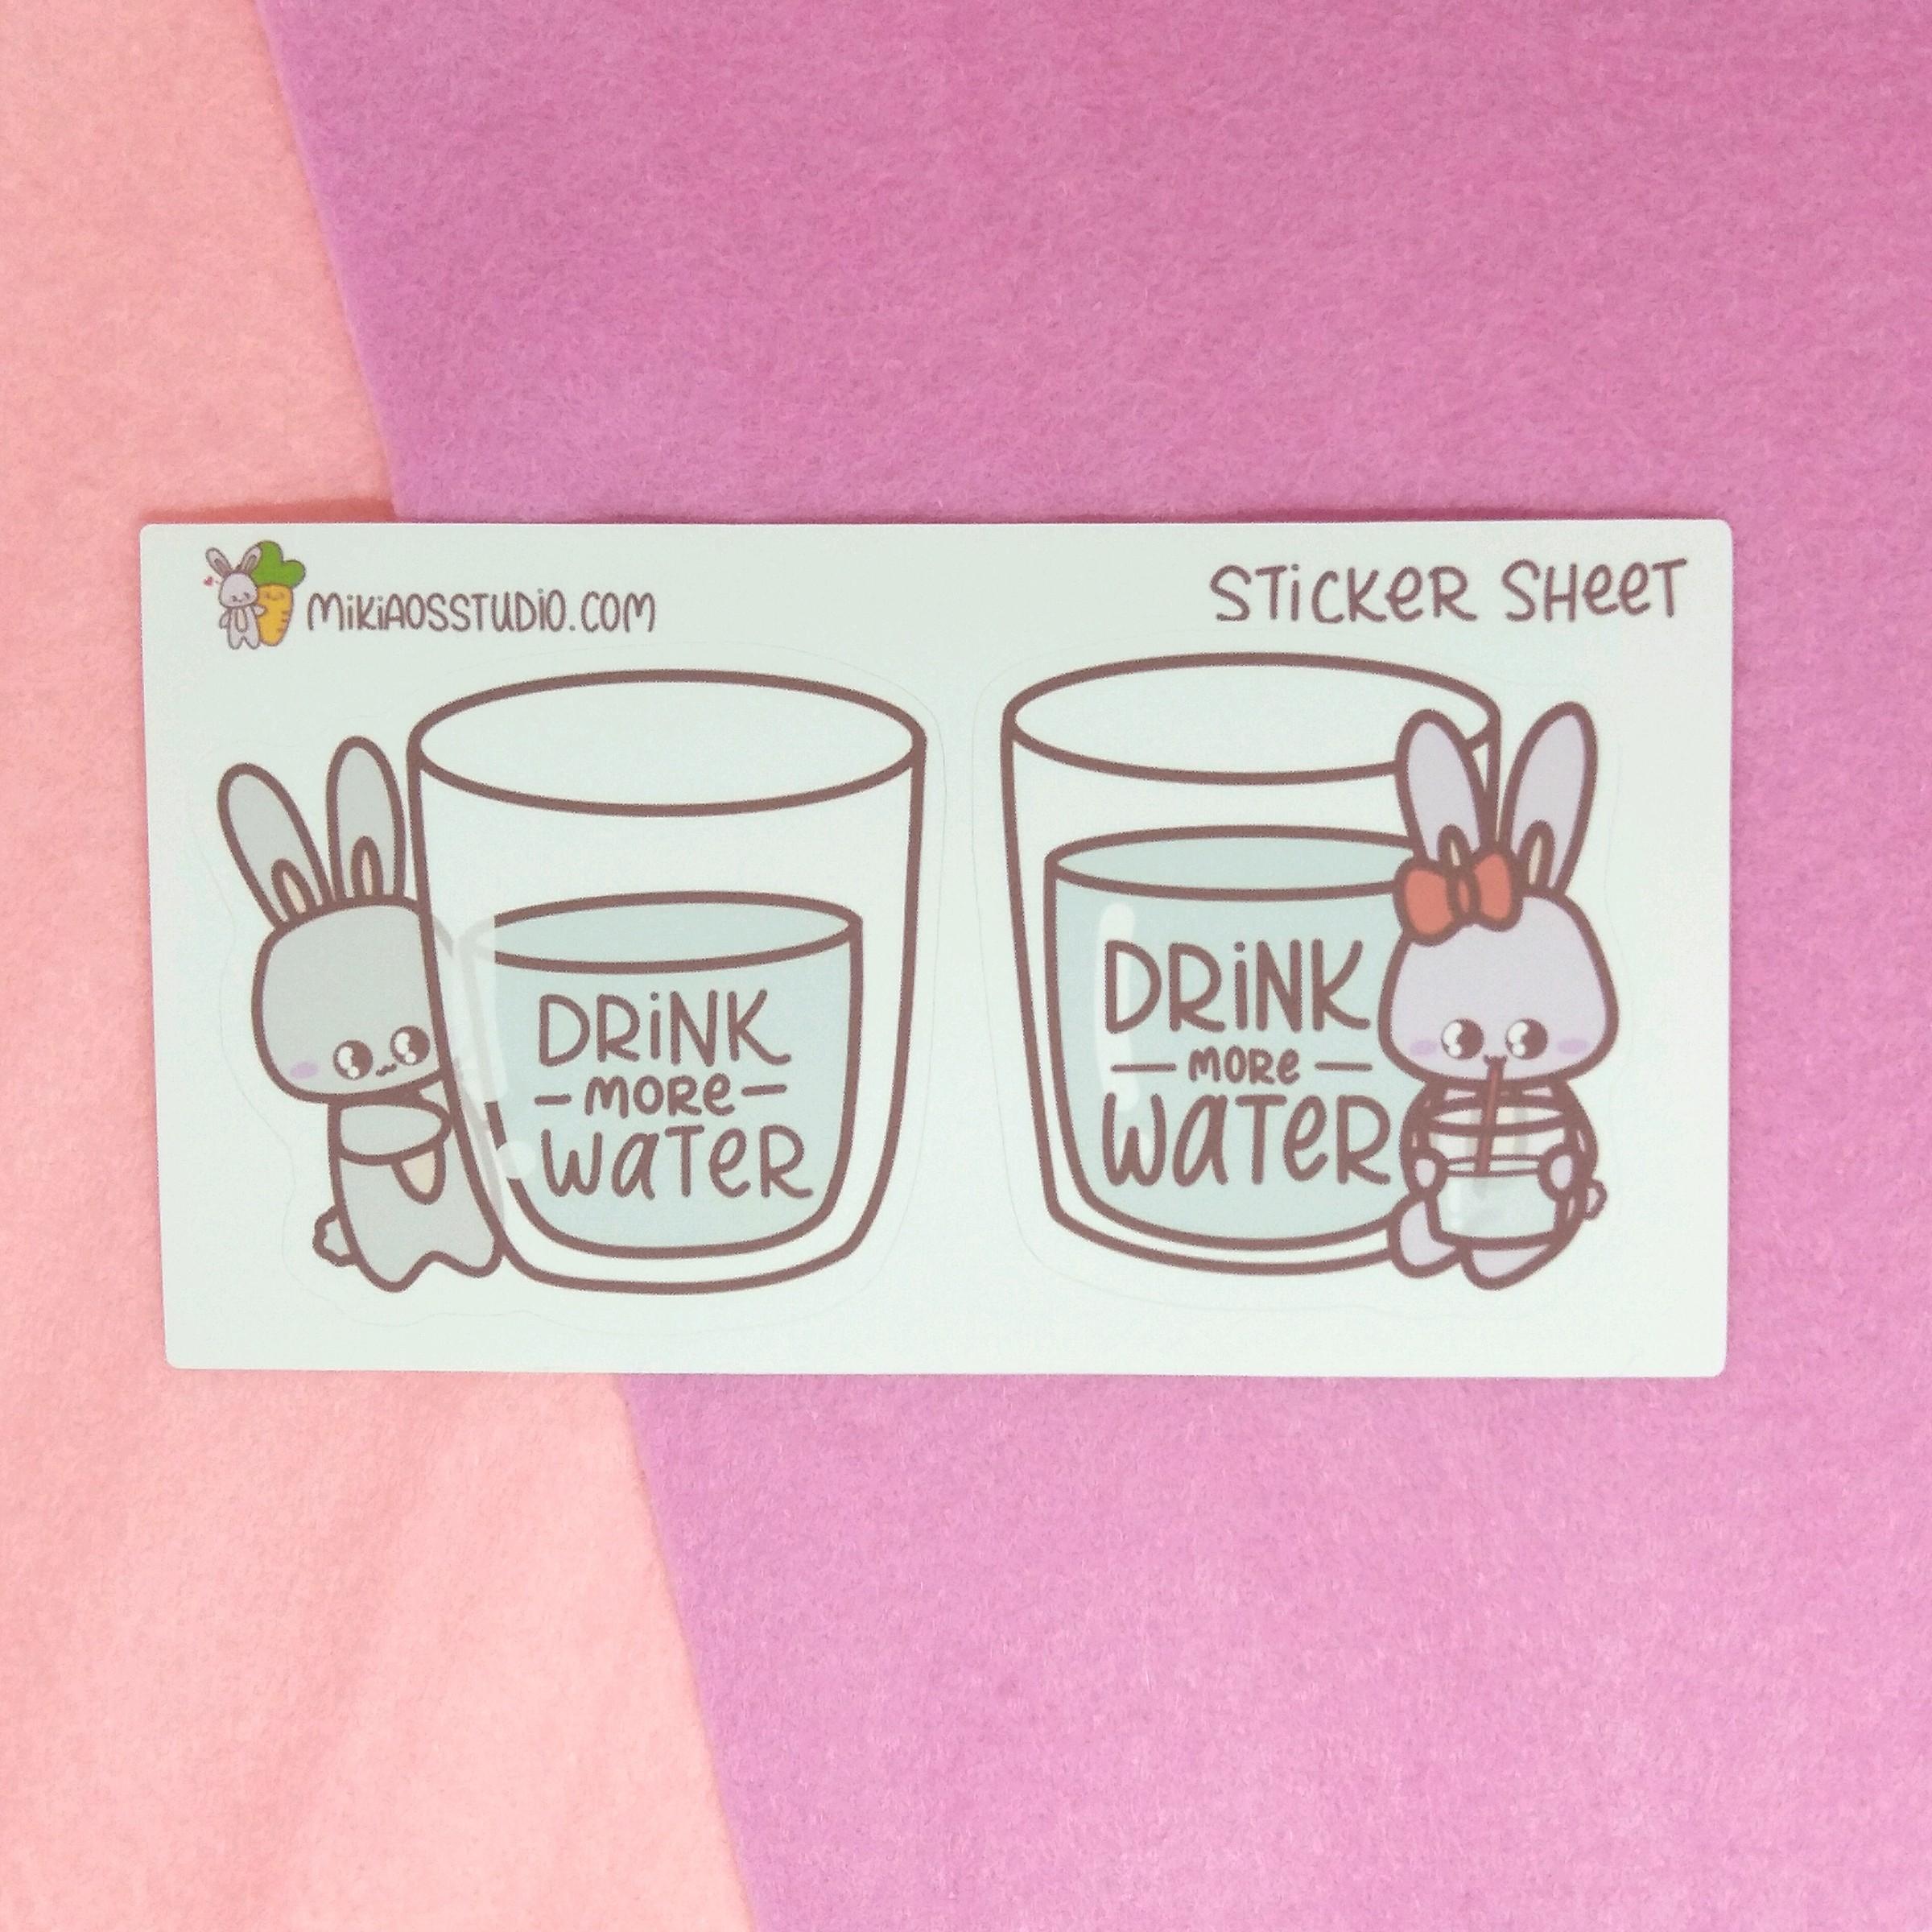 Drink More Water Sticker Sheet.jpg